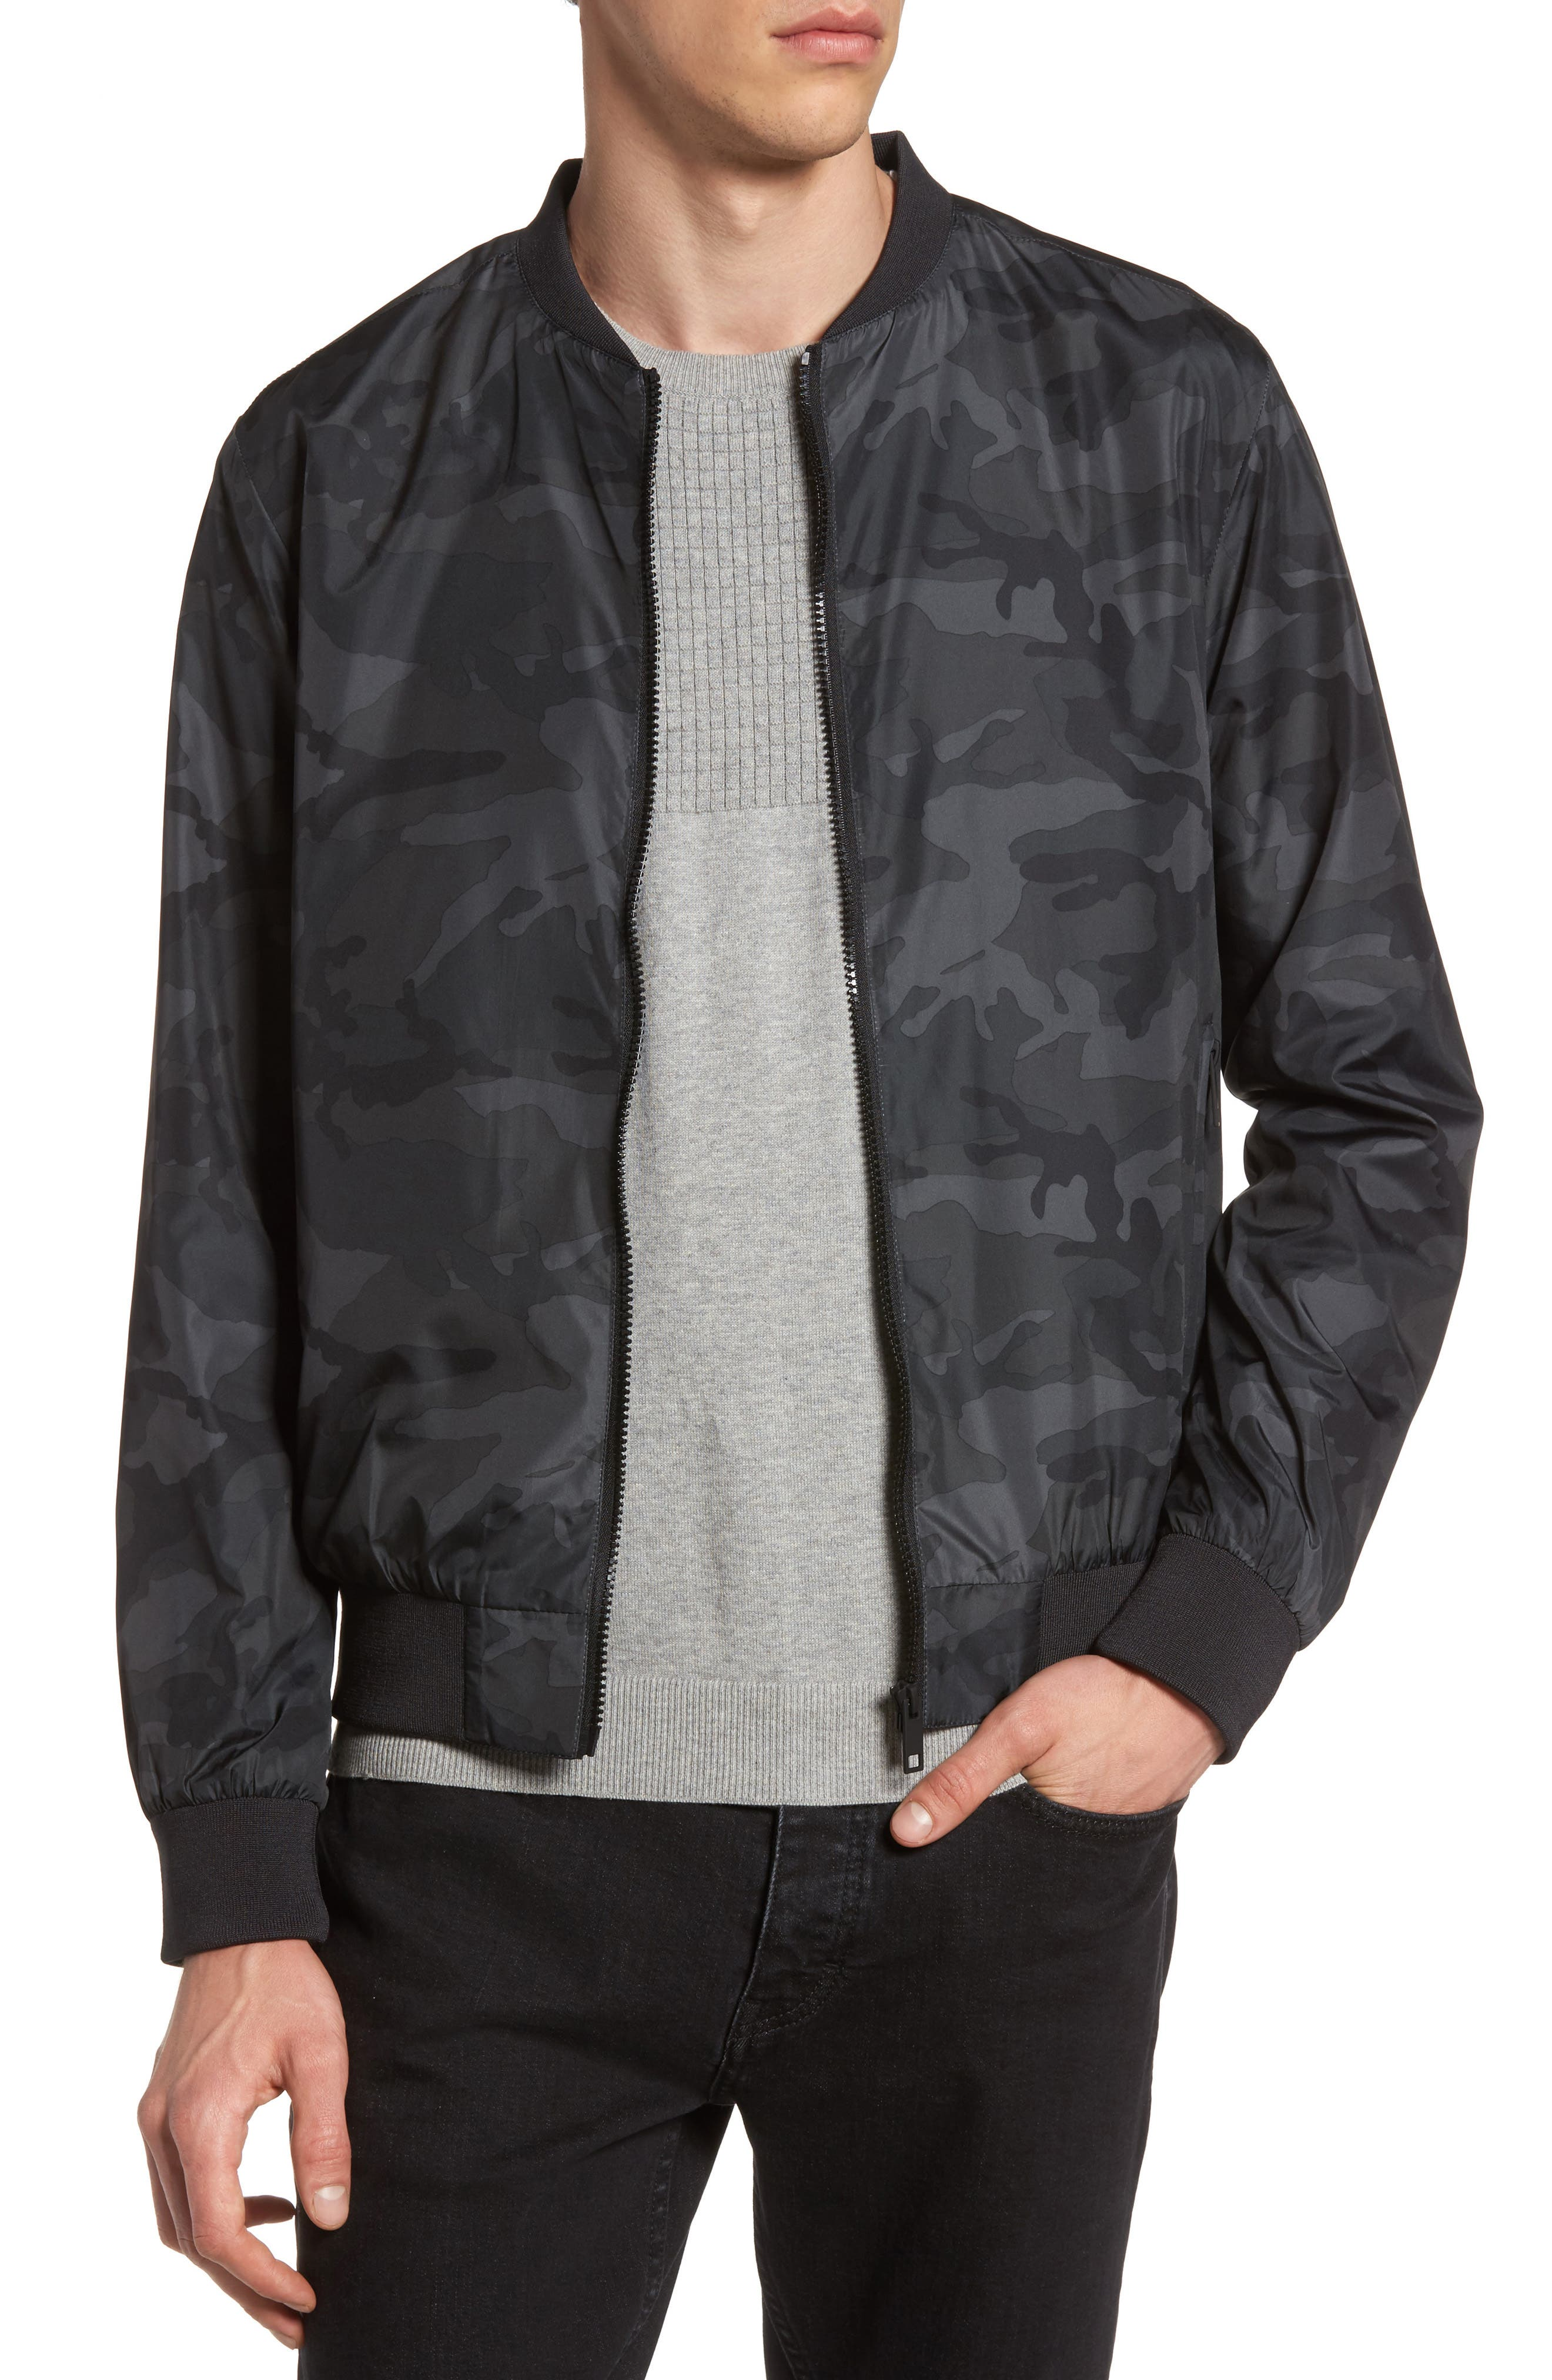 Topman Camo Print Bomber Jacket